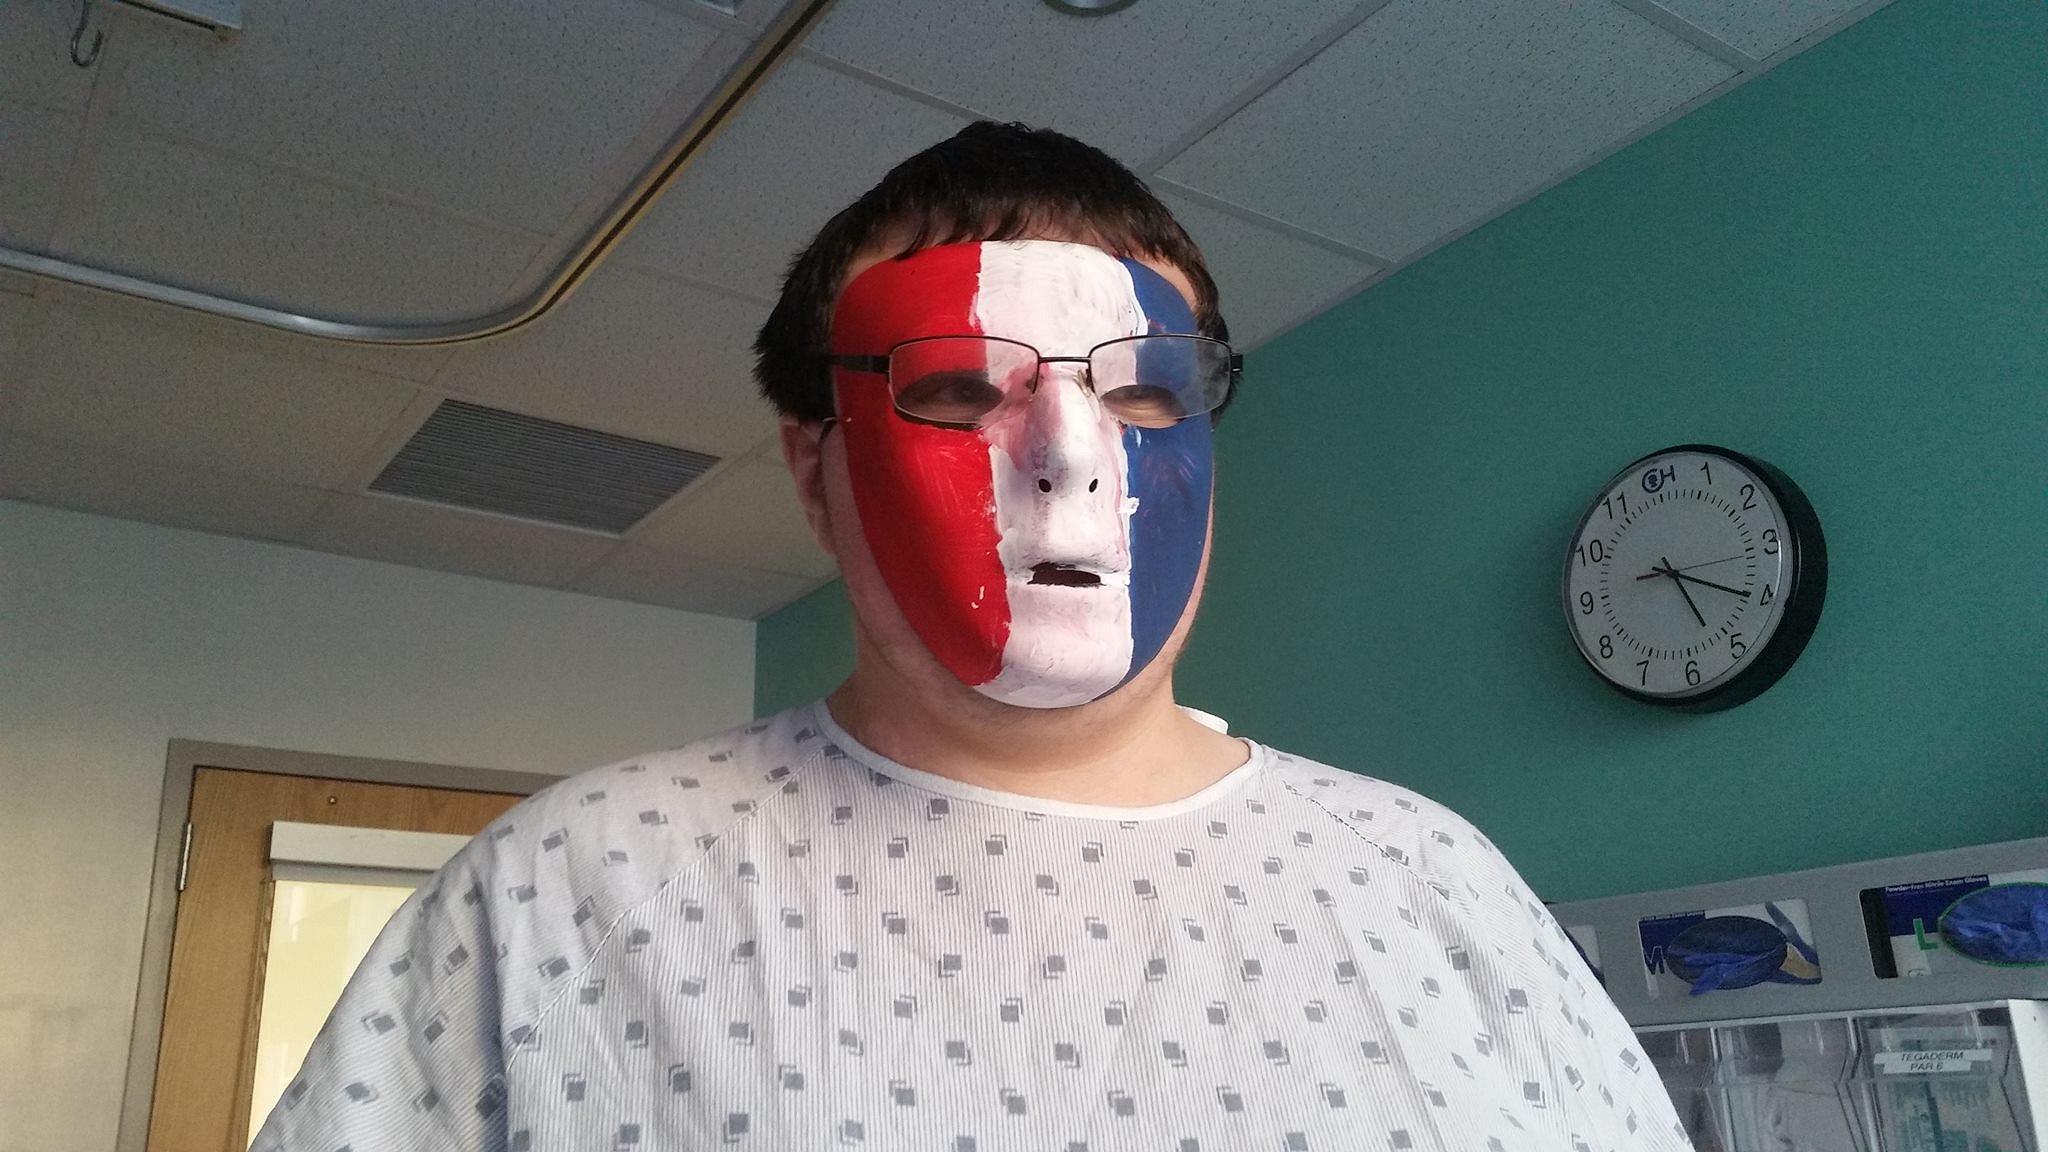 8 Years Post Transplant